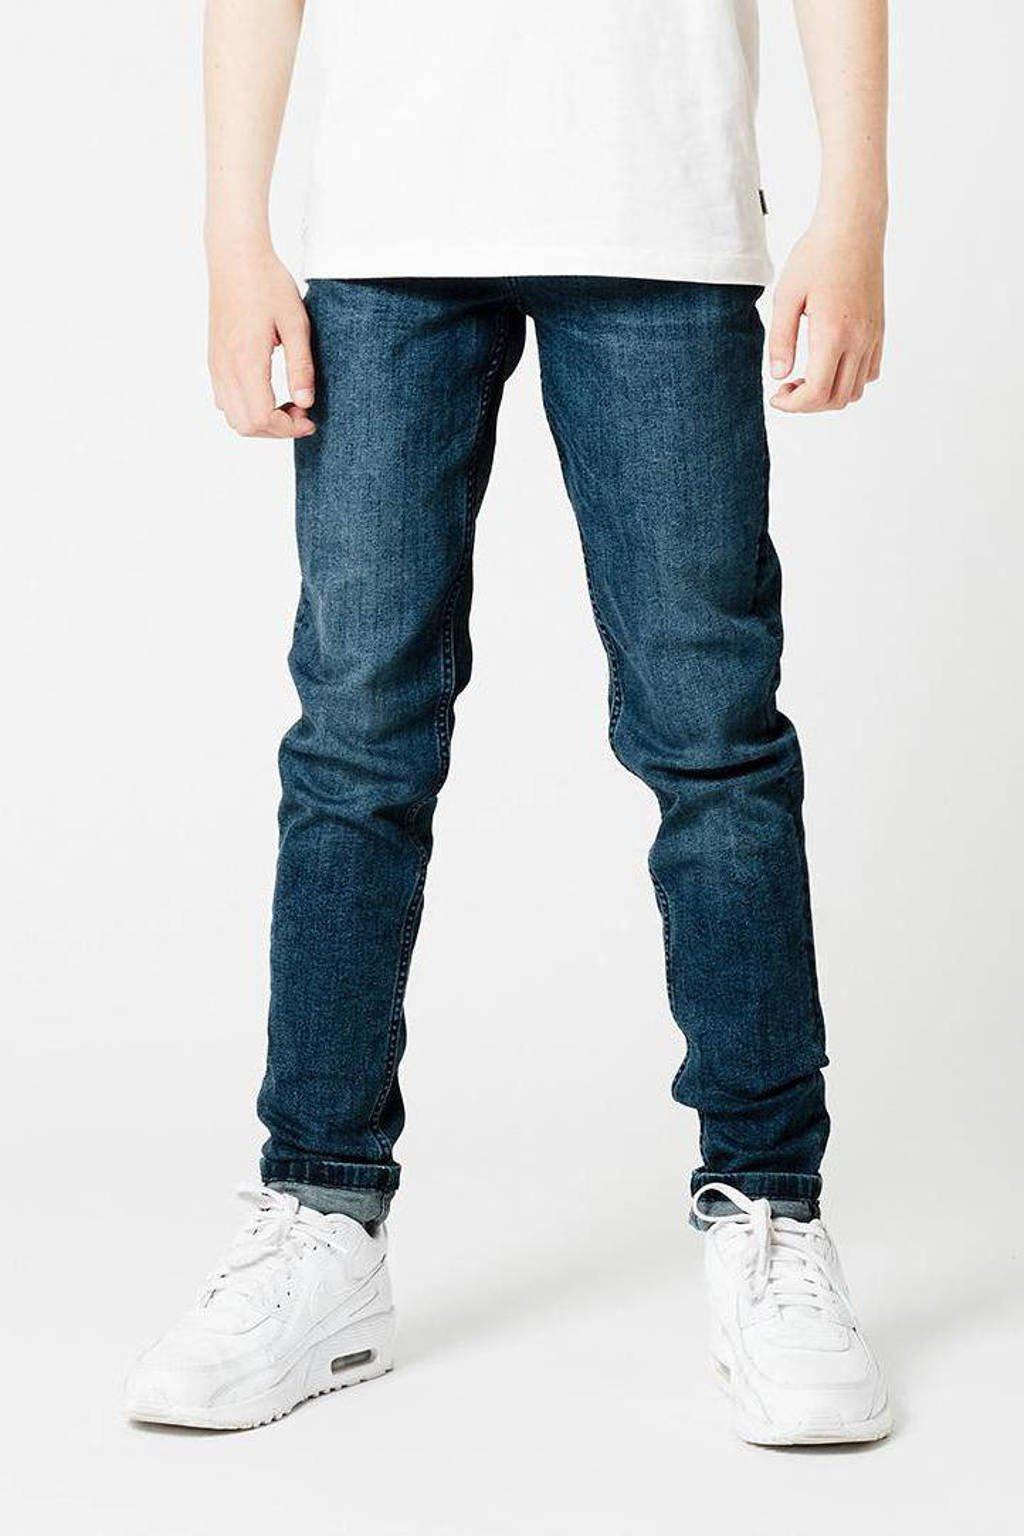 America Today Junior skinny jeans Kid Jr stonewashed, Stonewashed